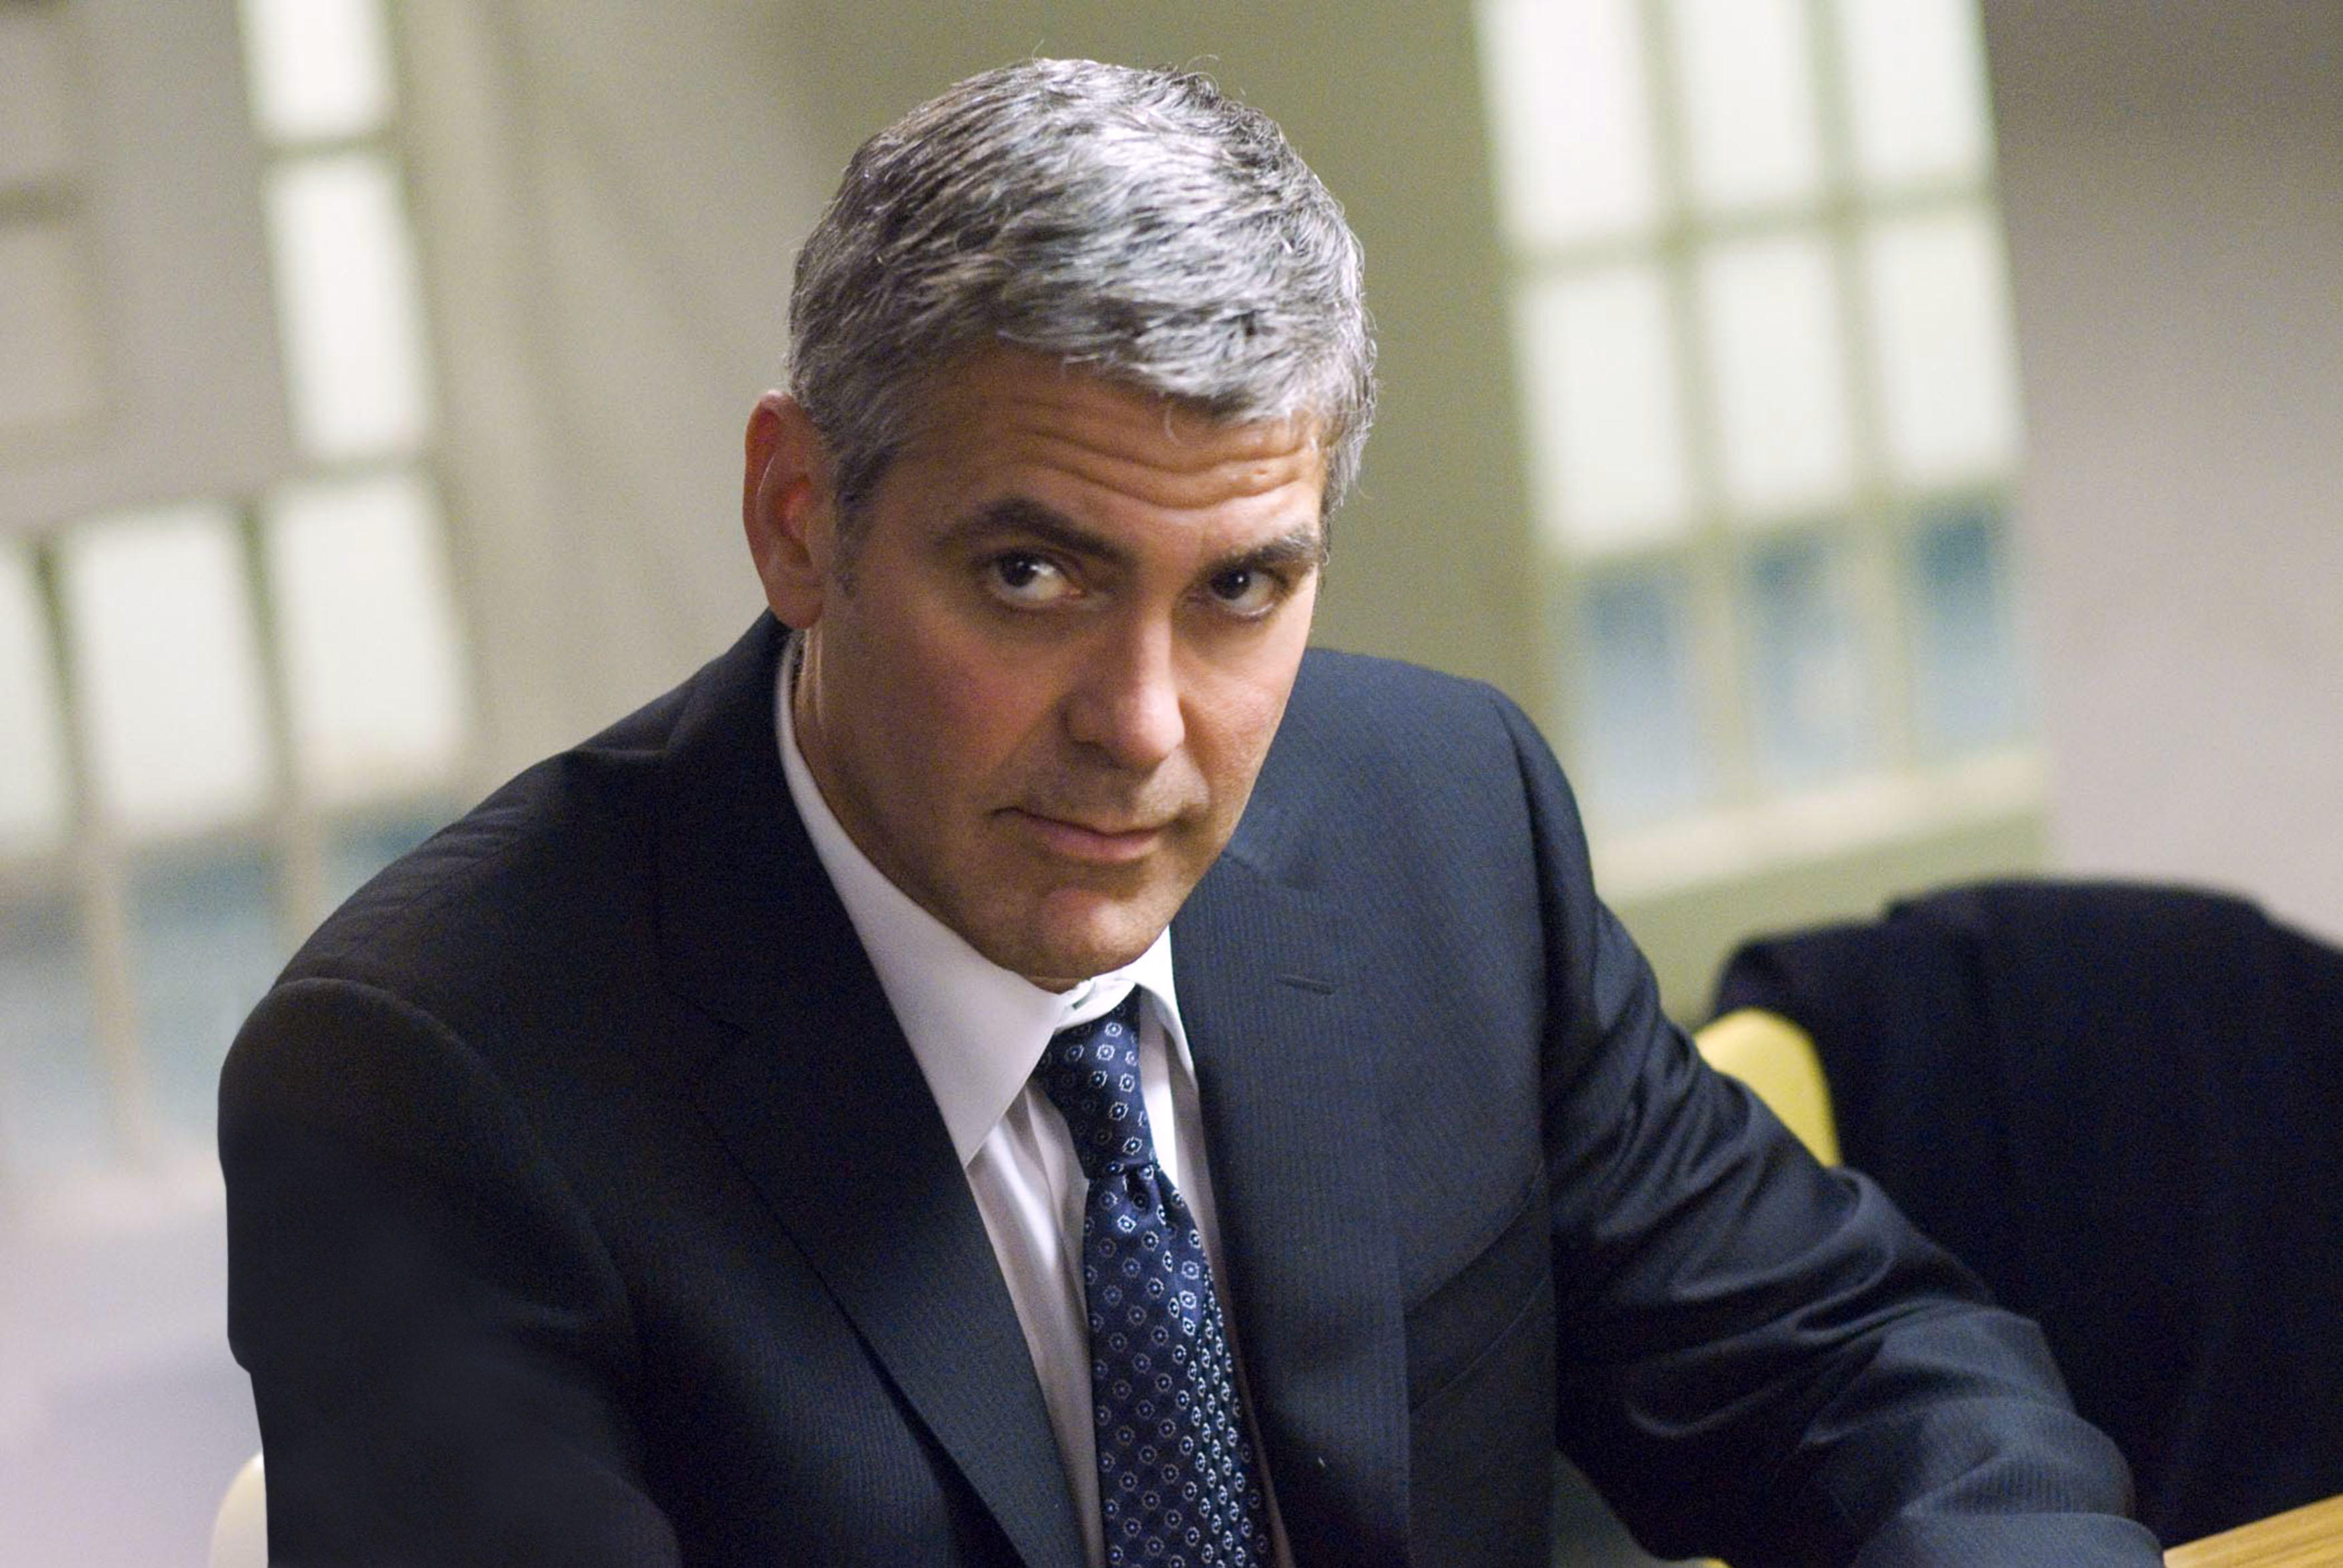 George Clooney, fascino senza tempo